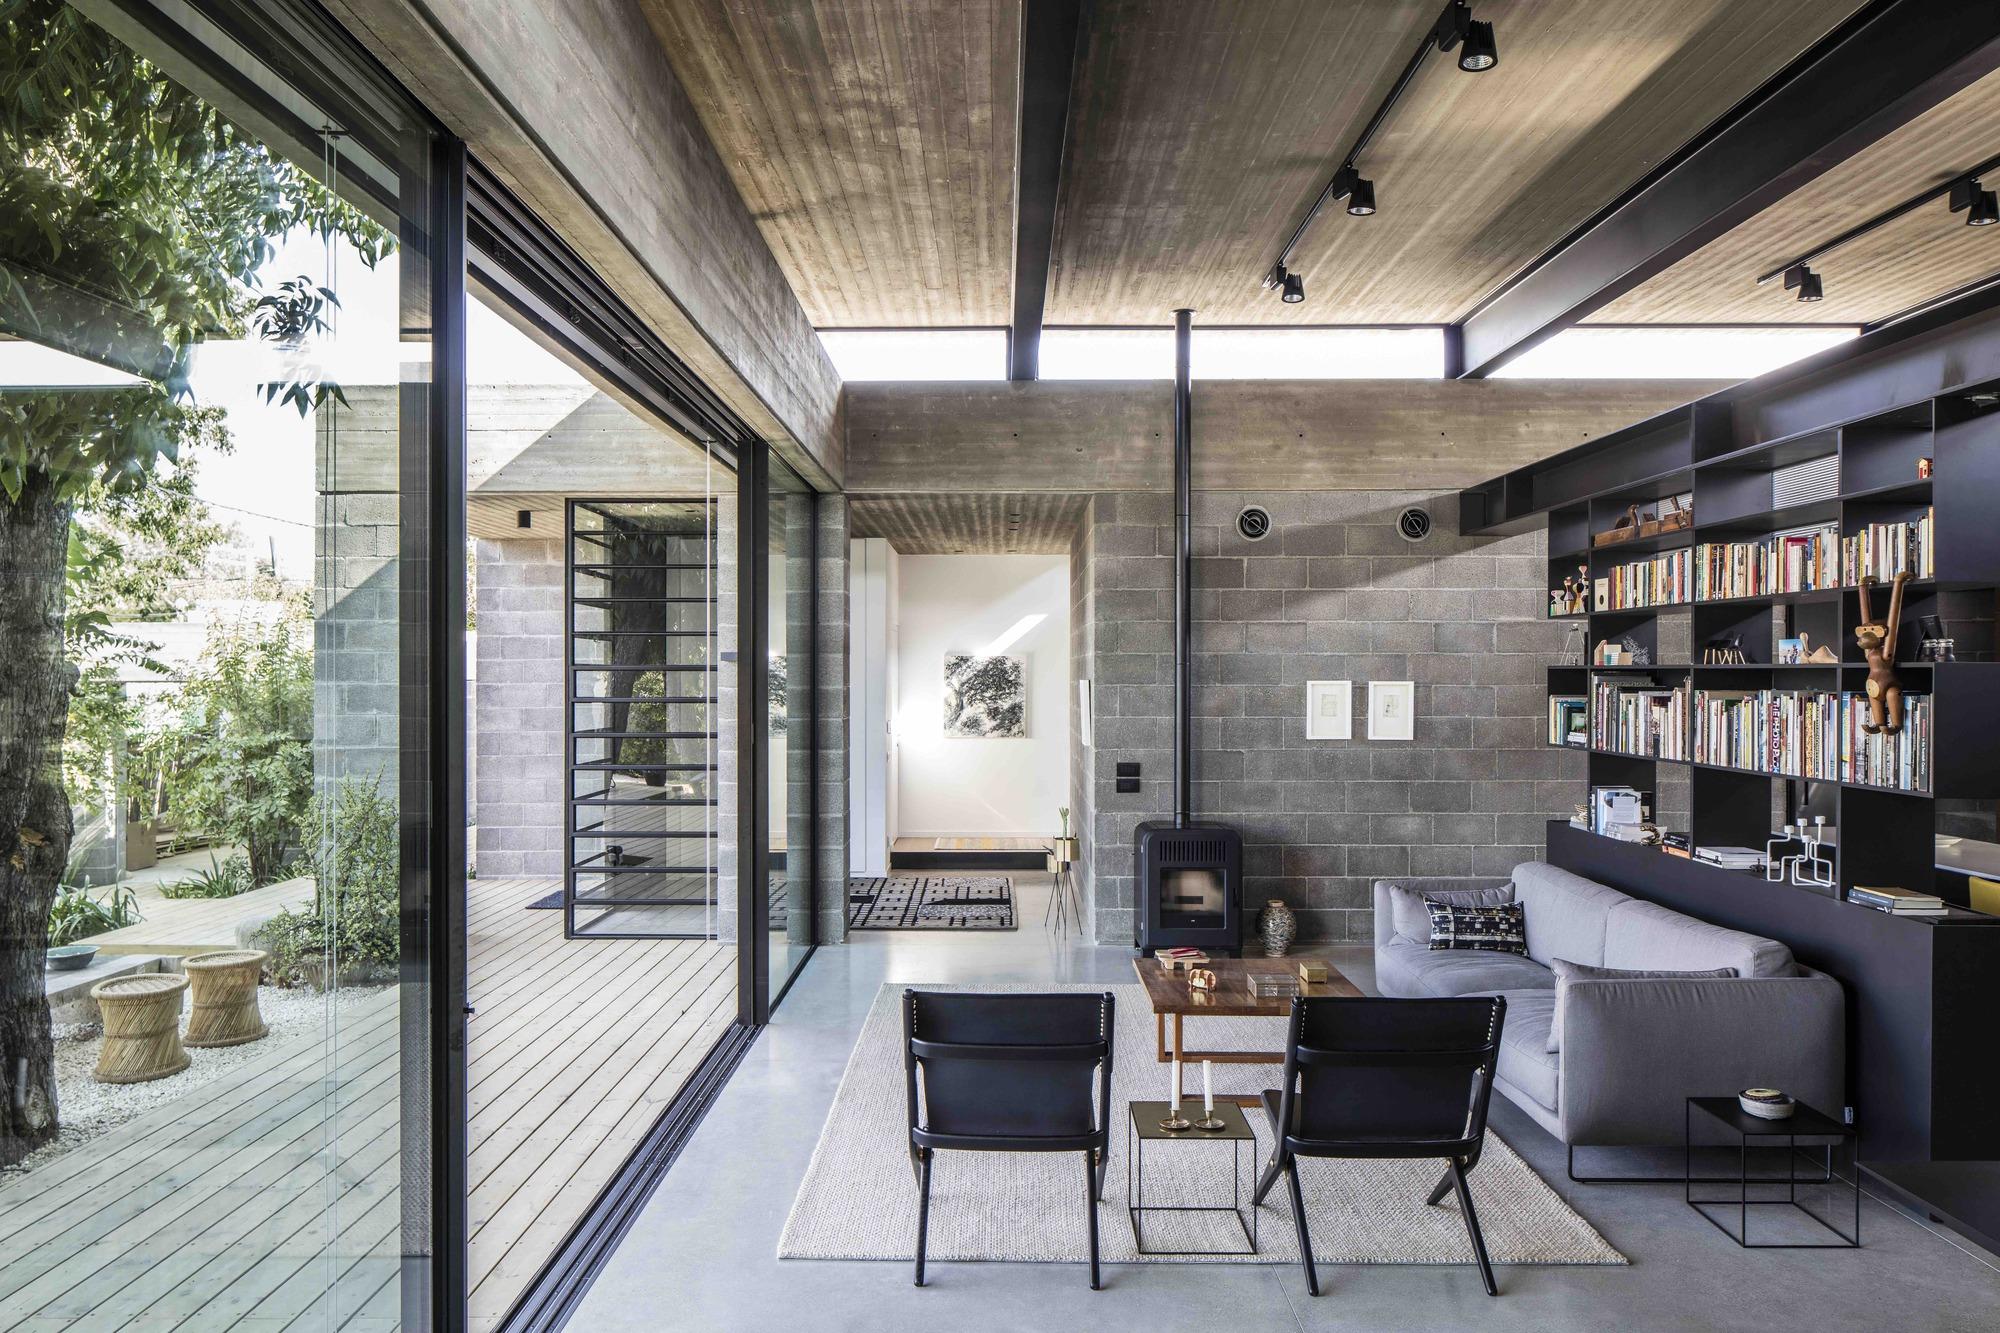 Casa Nua / Jacobs-Yaniv Architects